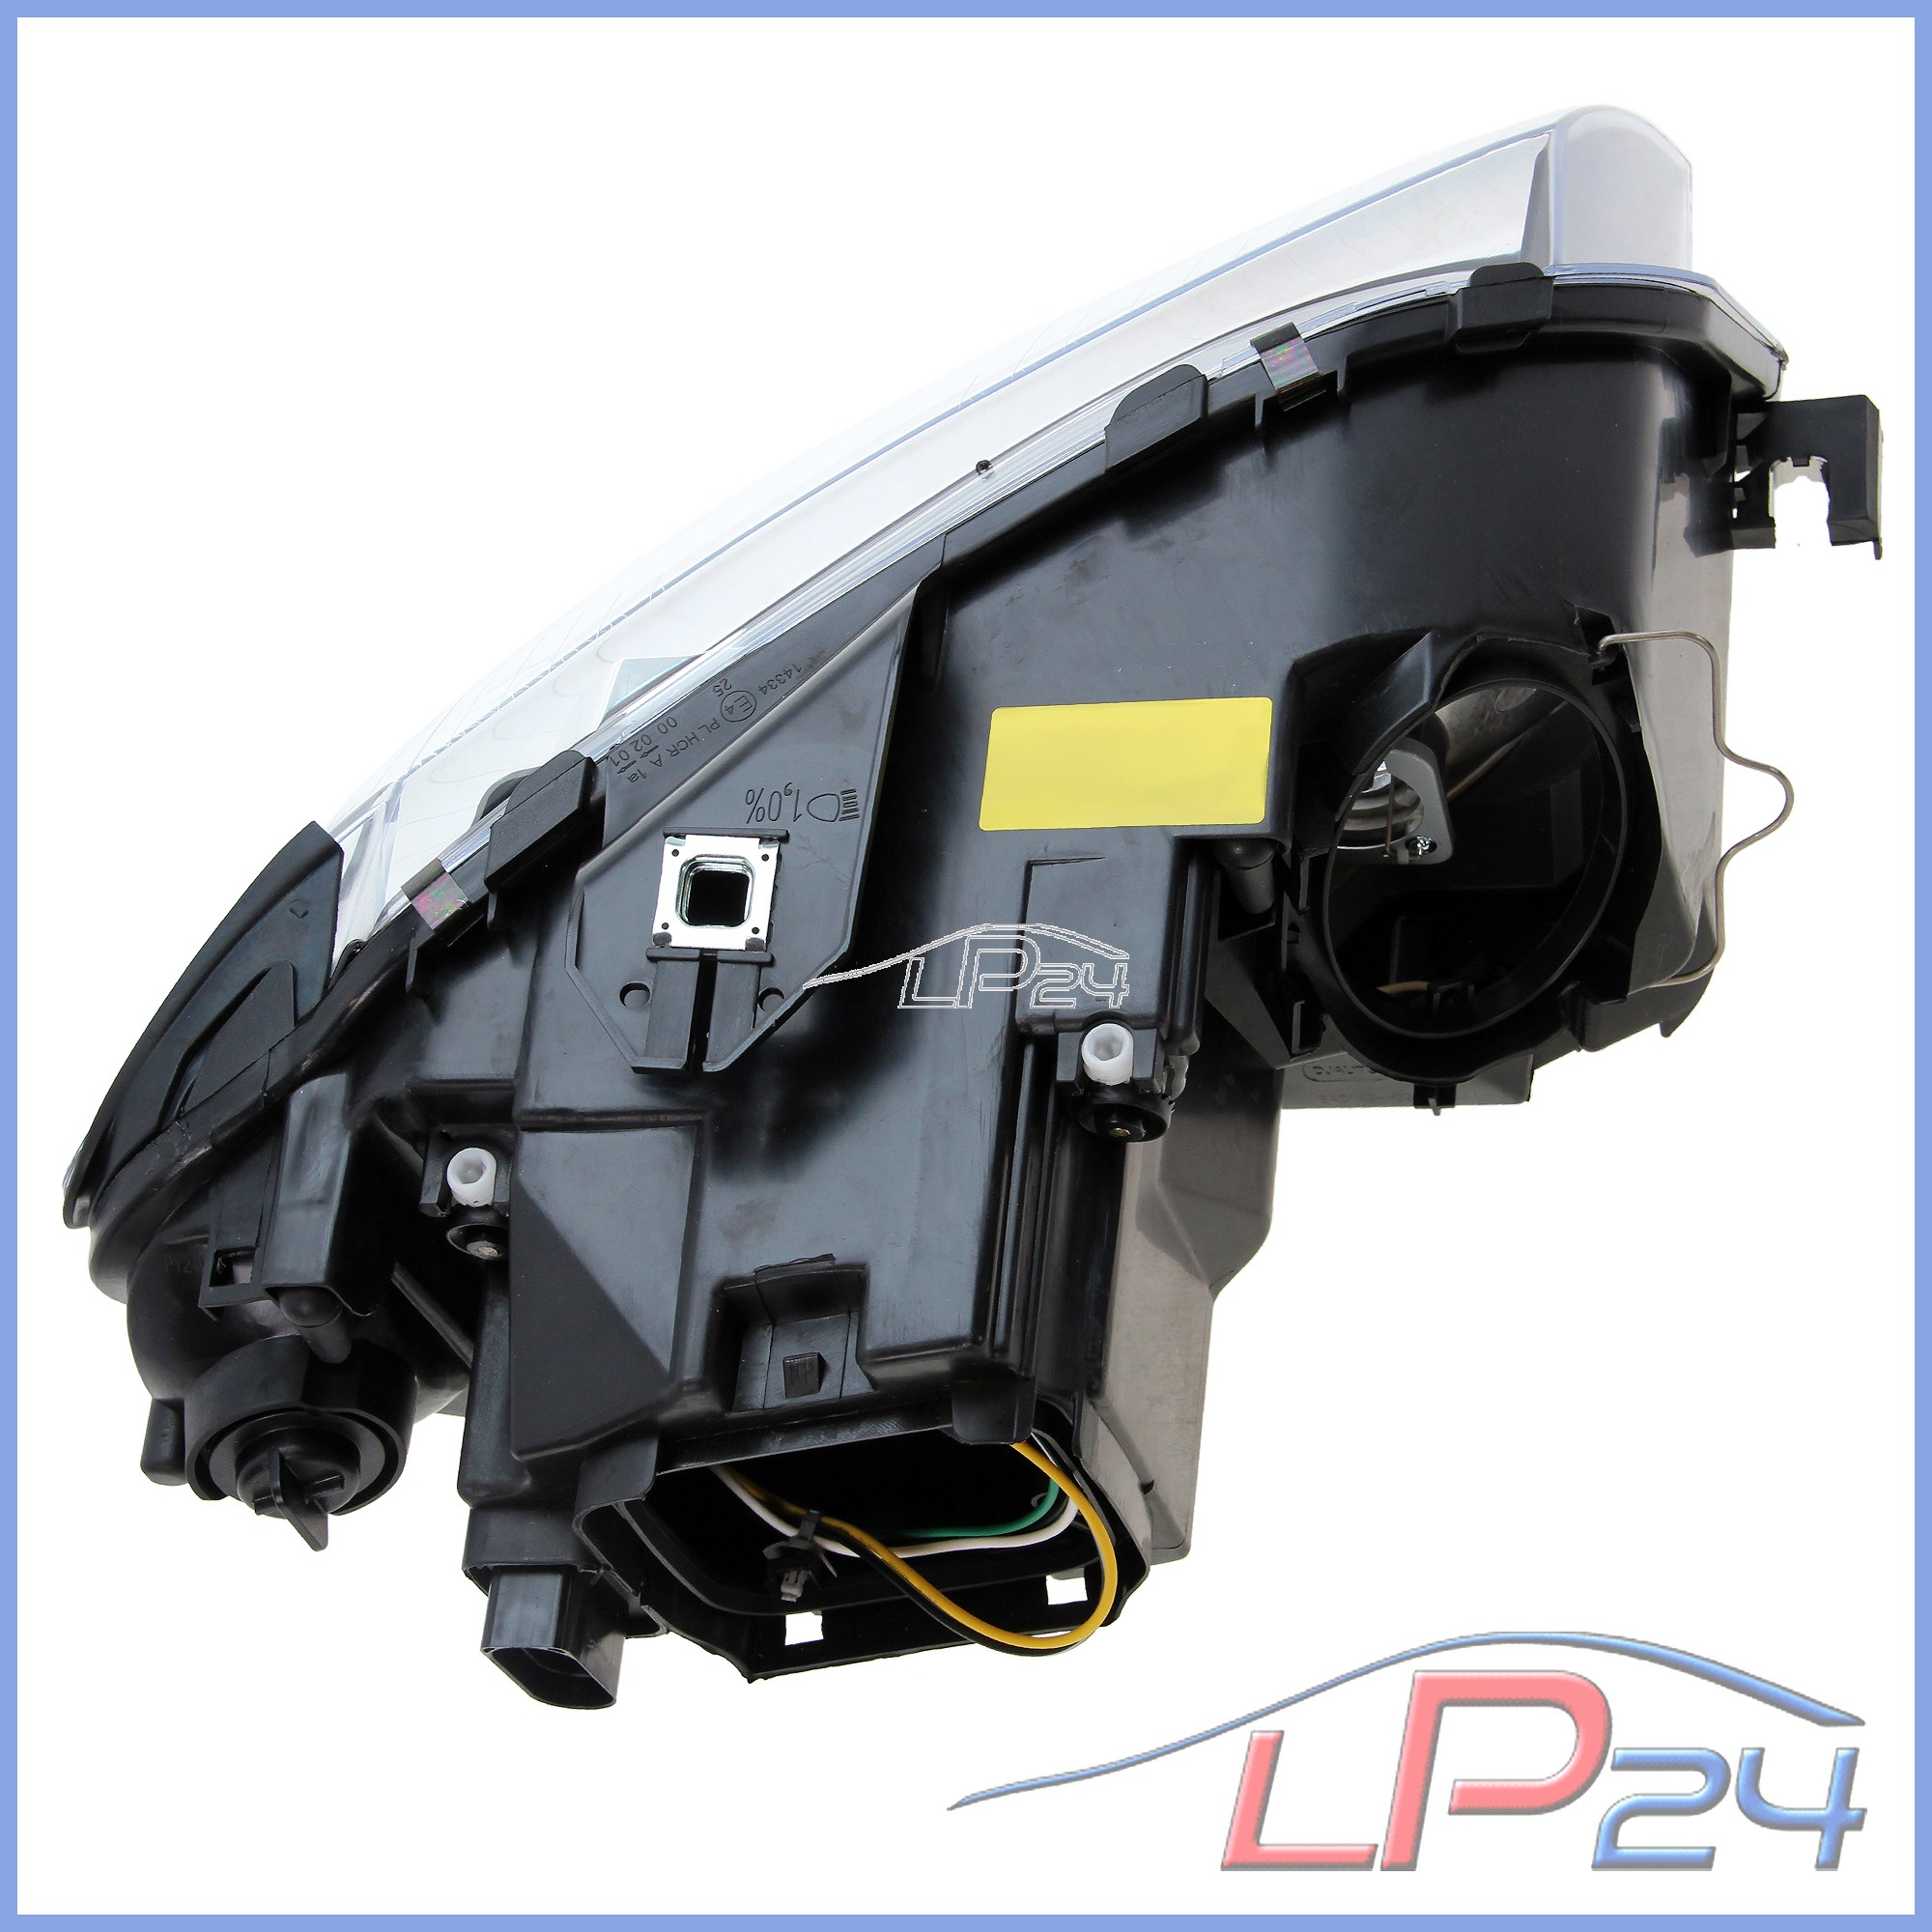 2x-PHARE-PRINCIPAL-H7-H7-AVANT-GAUCHE-DROIT-AUDI-A3-8P-SPORTBACK-03-08 miniature 3